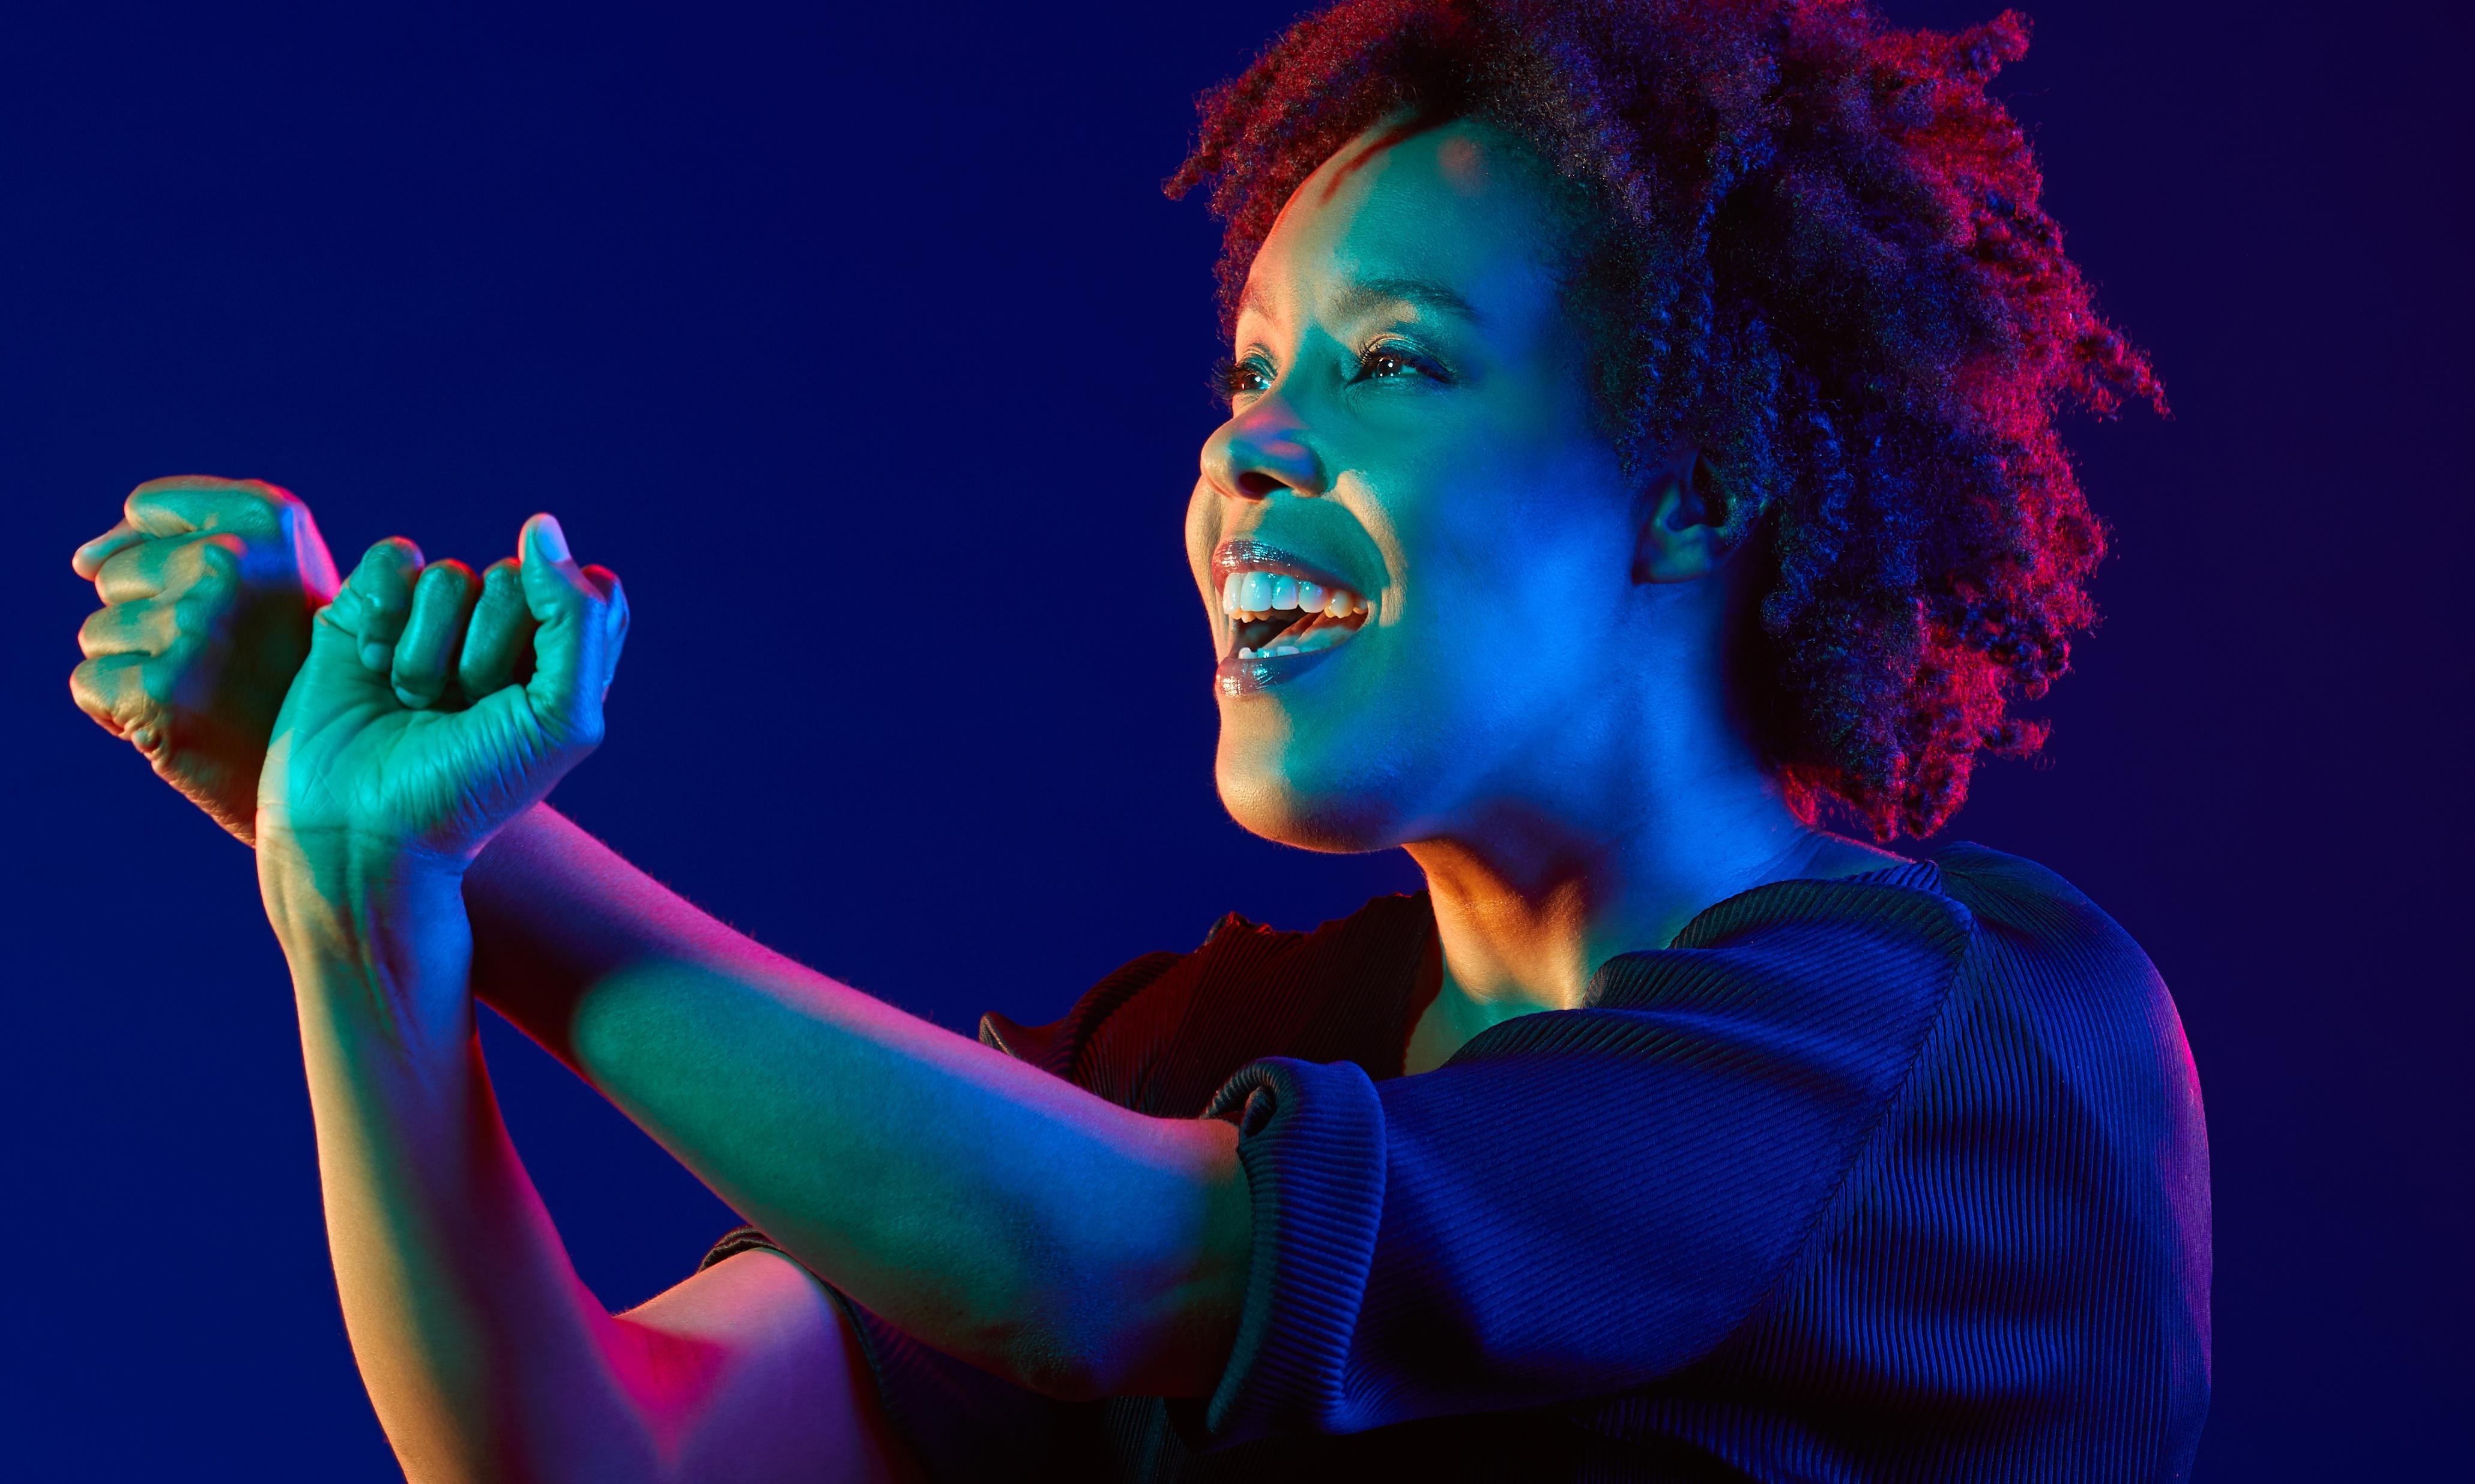 London Sinfonietta/Baker review – Tansy Davies' distinctive music lingers